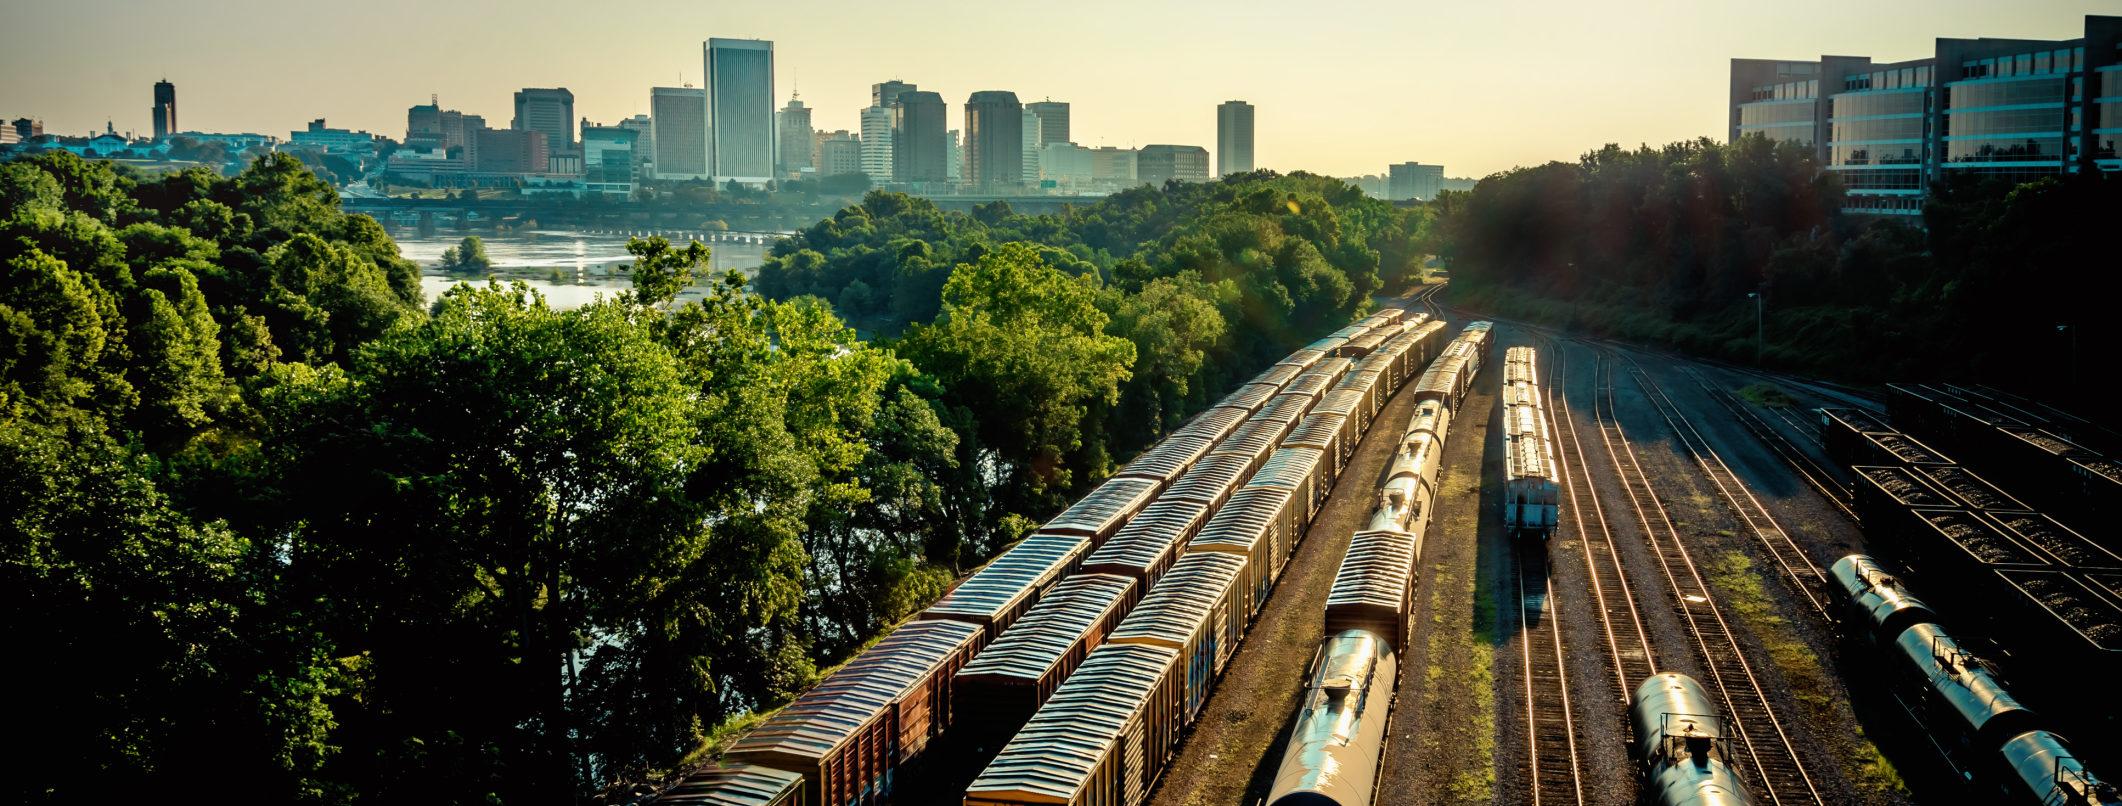 Train tracks across mexico clipart graphic free Railroad 101 - Association of American Railroads graphic free